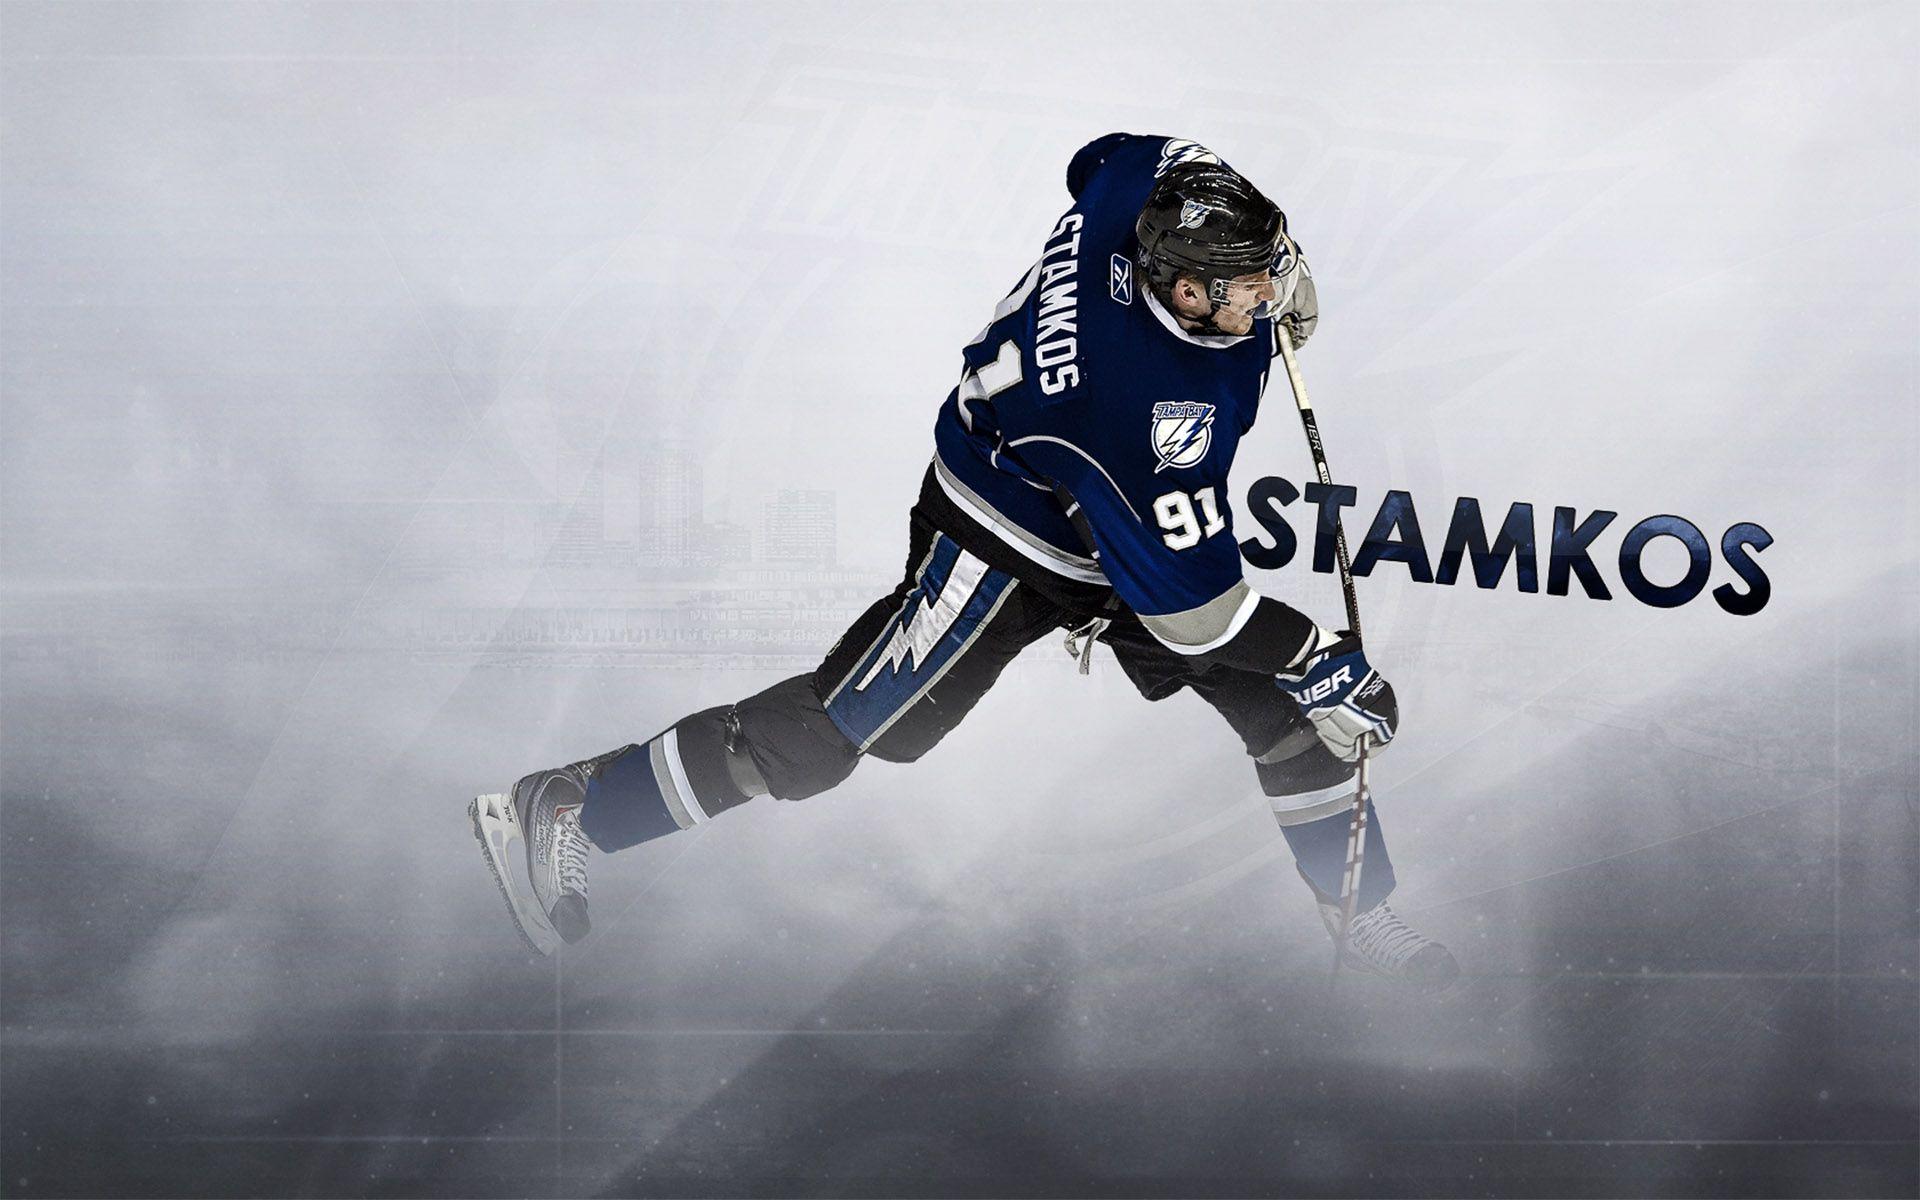 Stevenstamkos nhl hockey background wallpaper http - Nhl hockey wallpapers ...